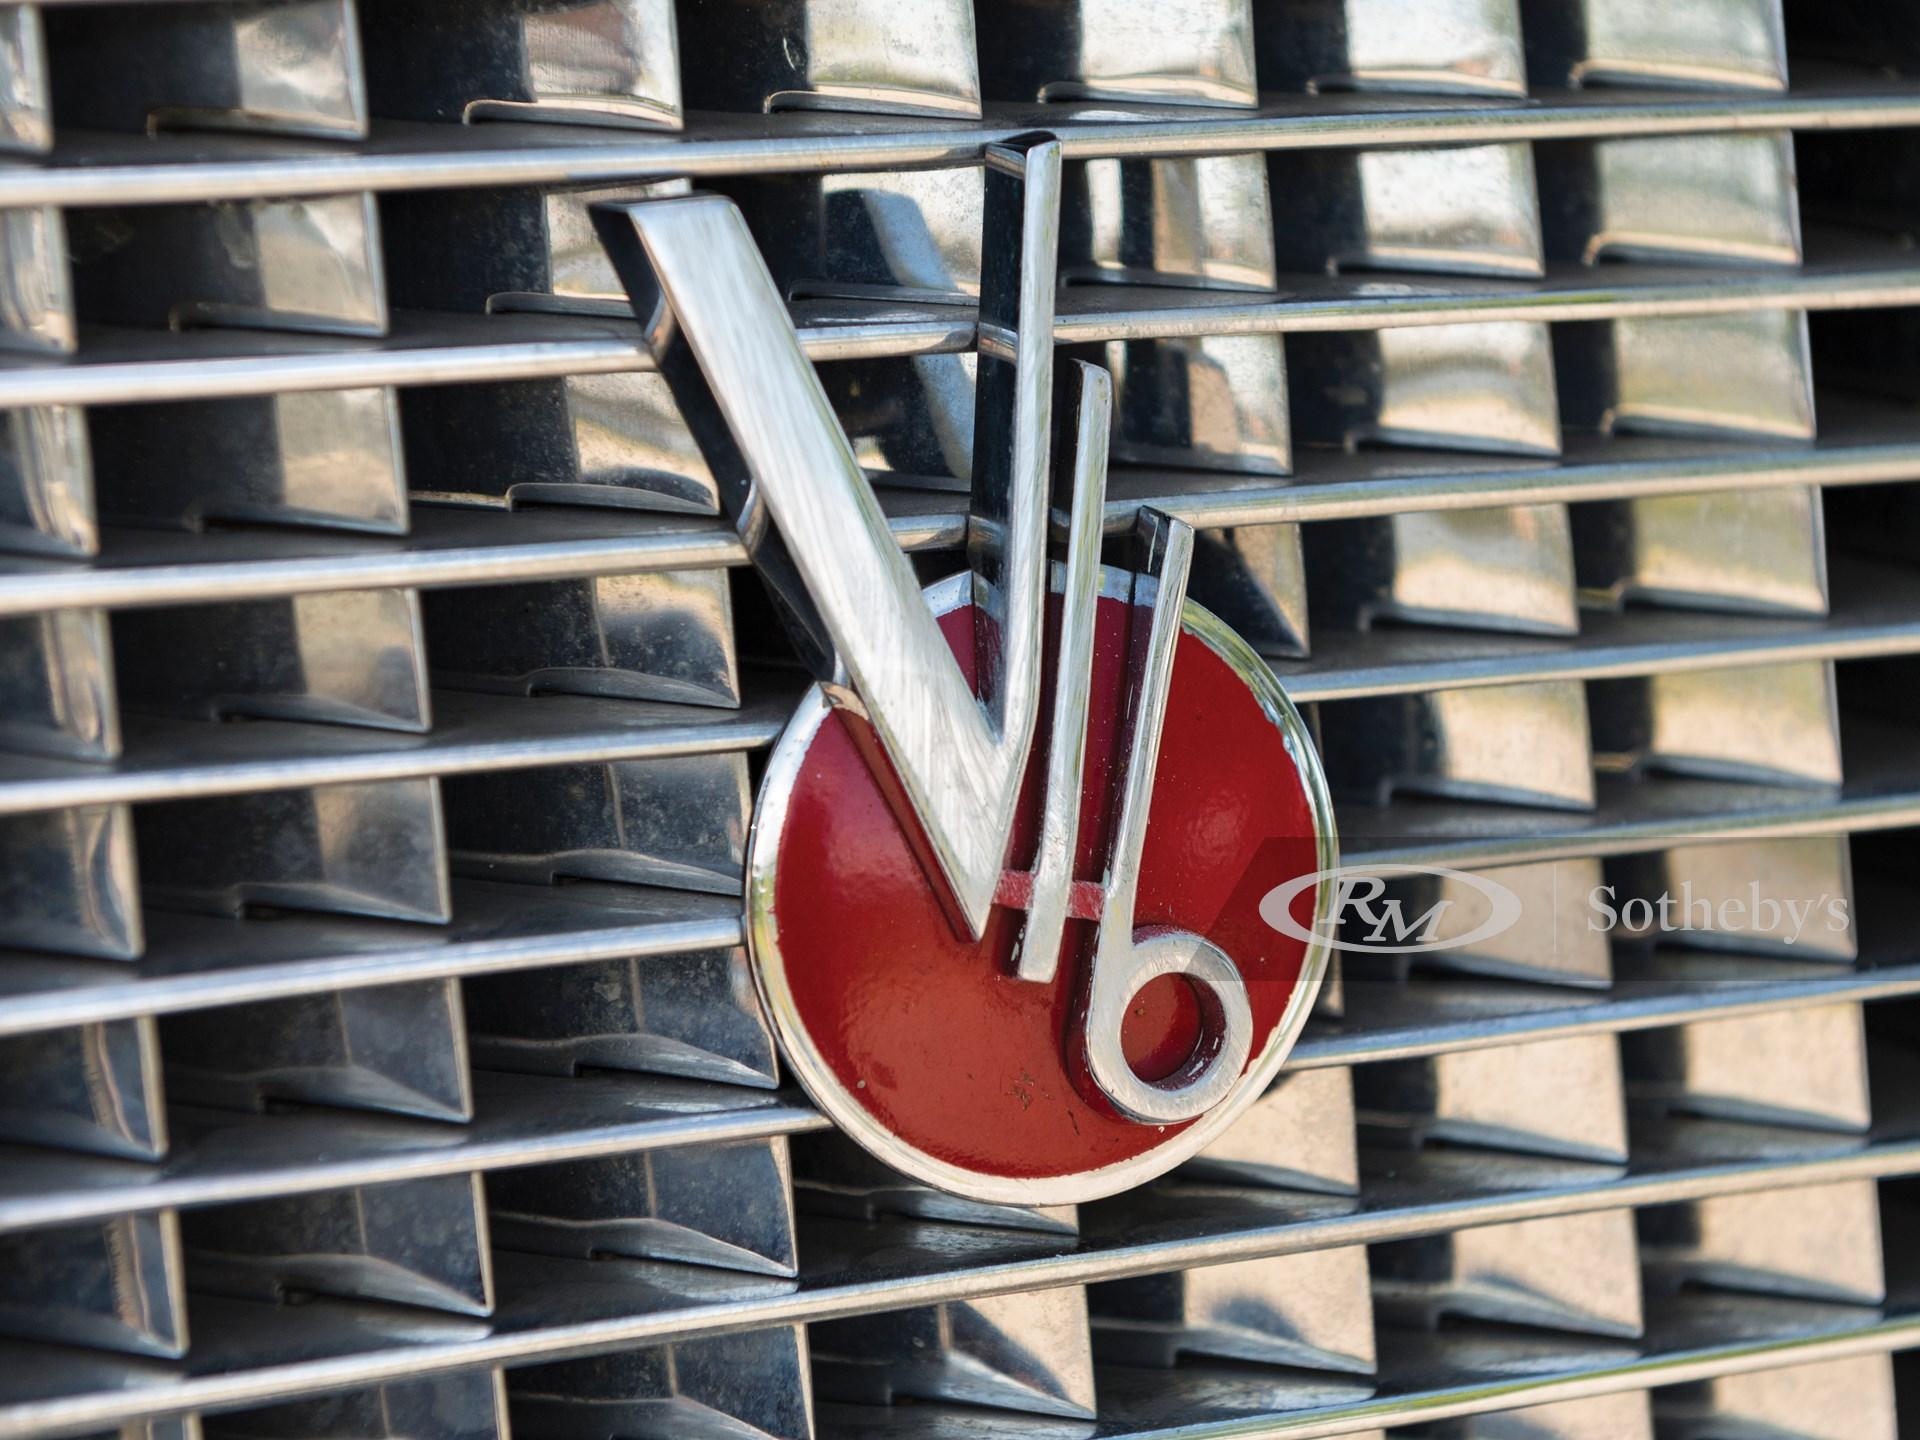 1937 Cadillac V-16 Seven-Passenger Limousine by Fleetwood -